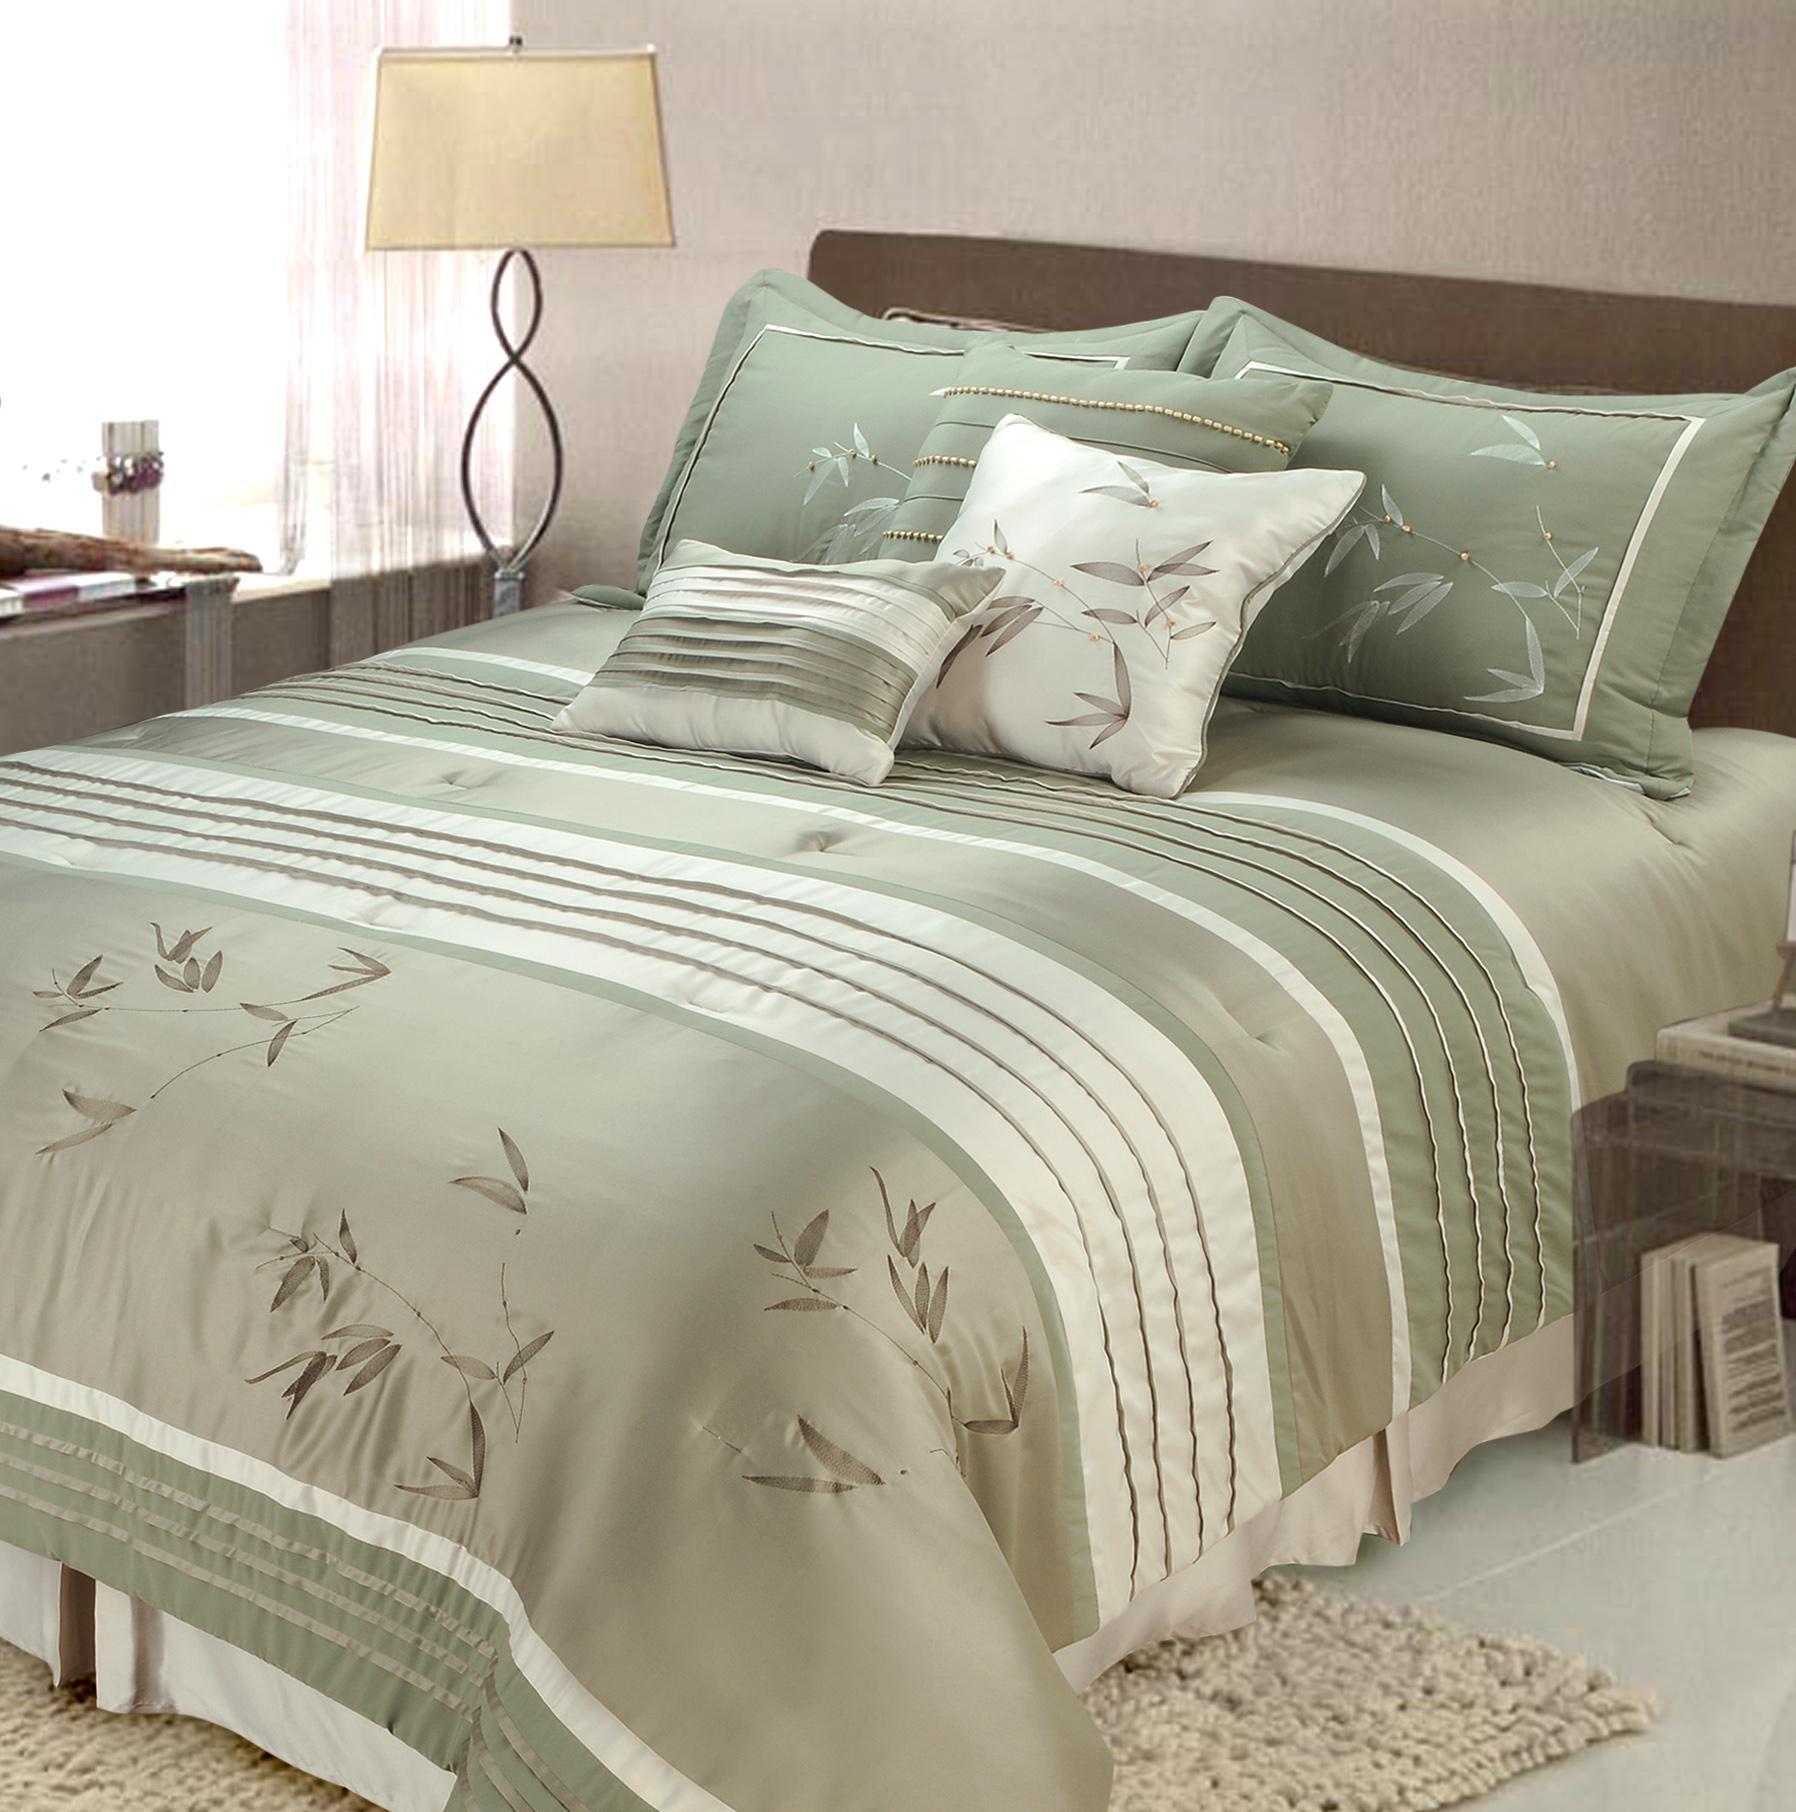 Jenny George Designs Sansai 7-piece Full/ Queen-size Comforter Set